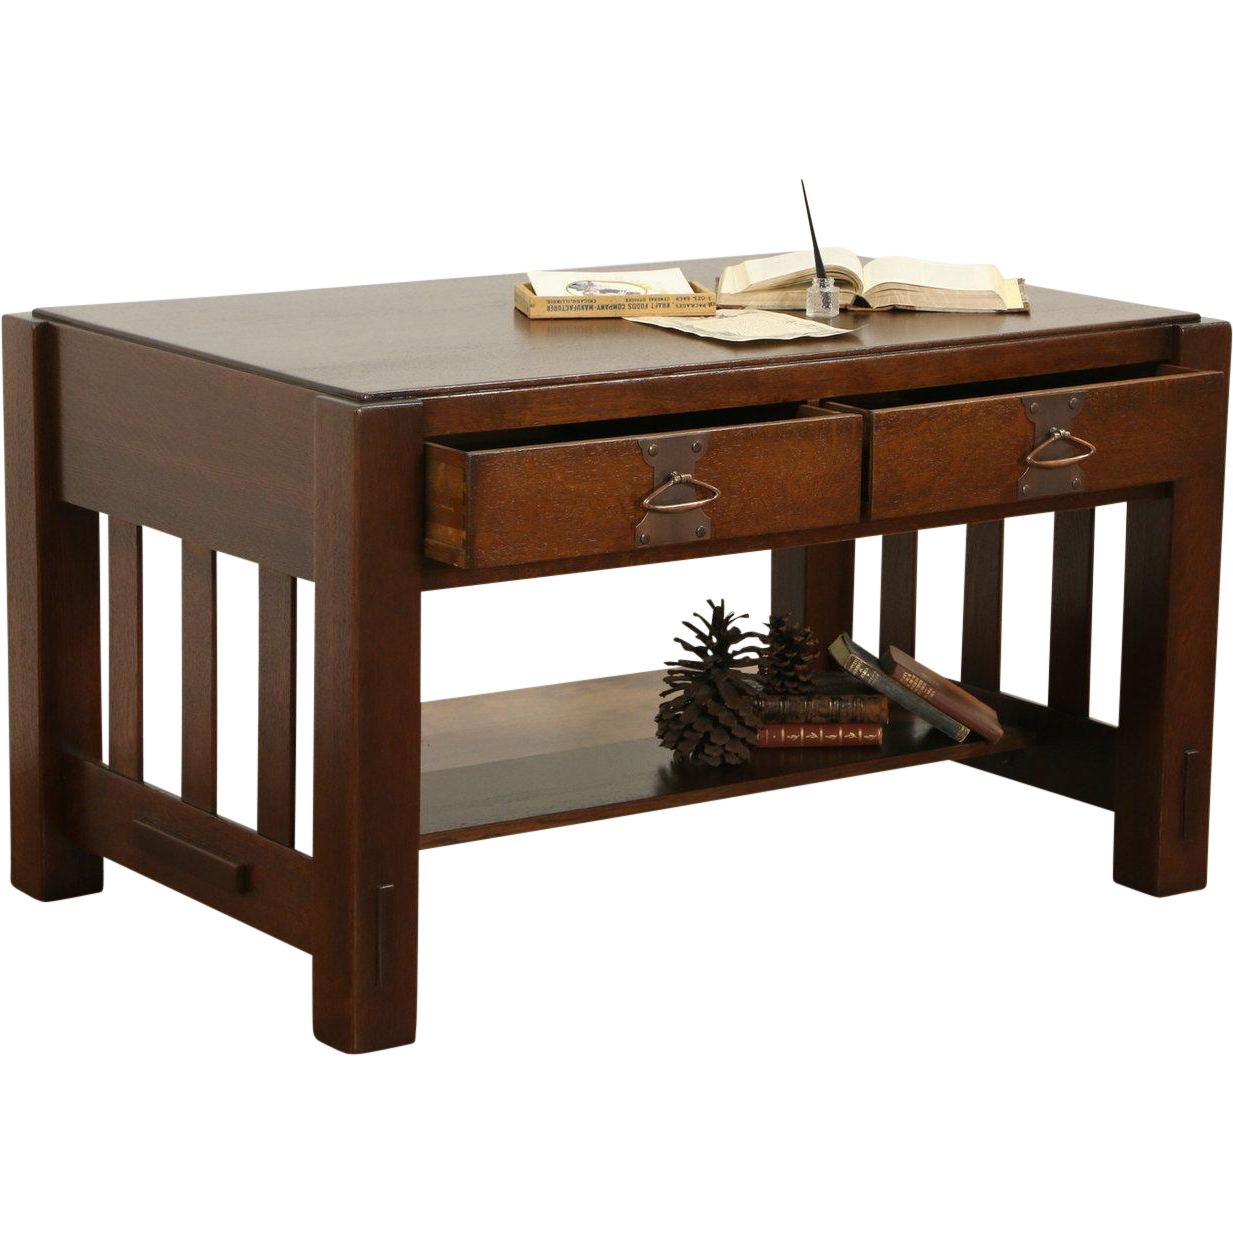 Arts & Crafts Mission Oak 1905 Antique Library Table, Original Hardware